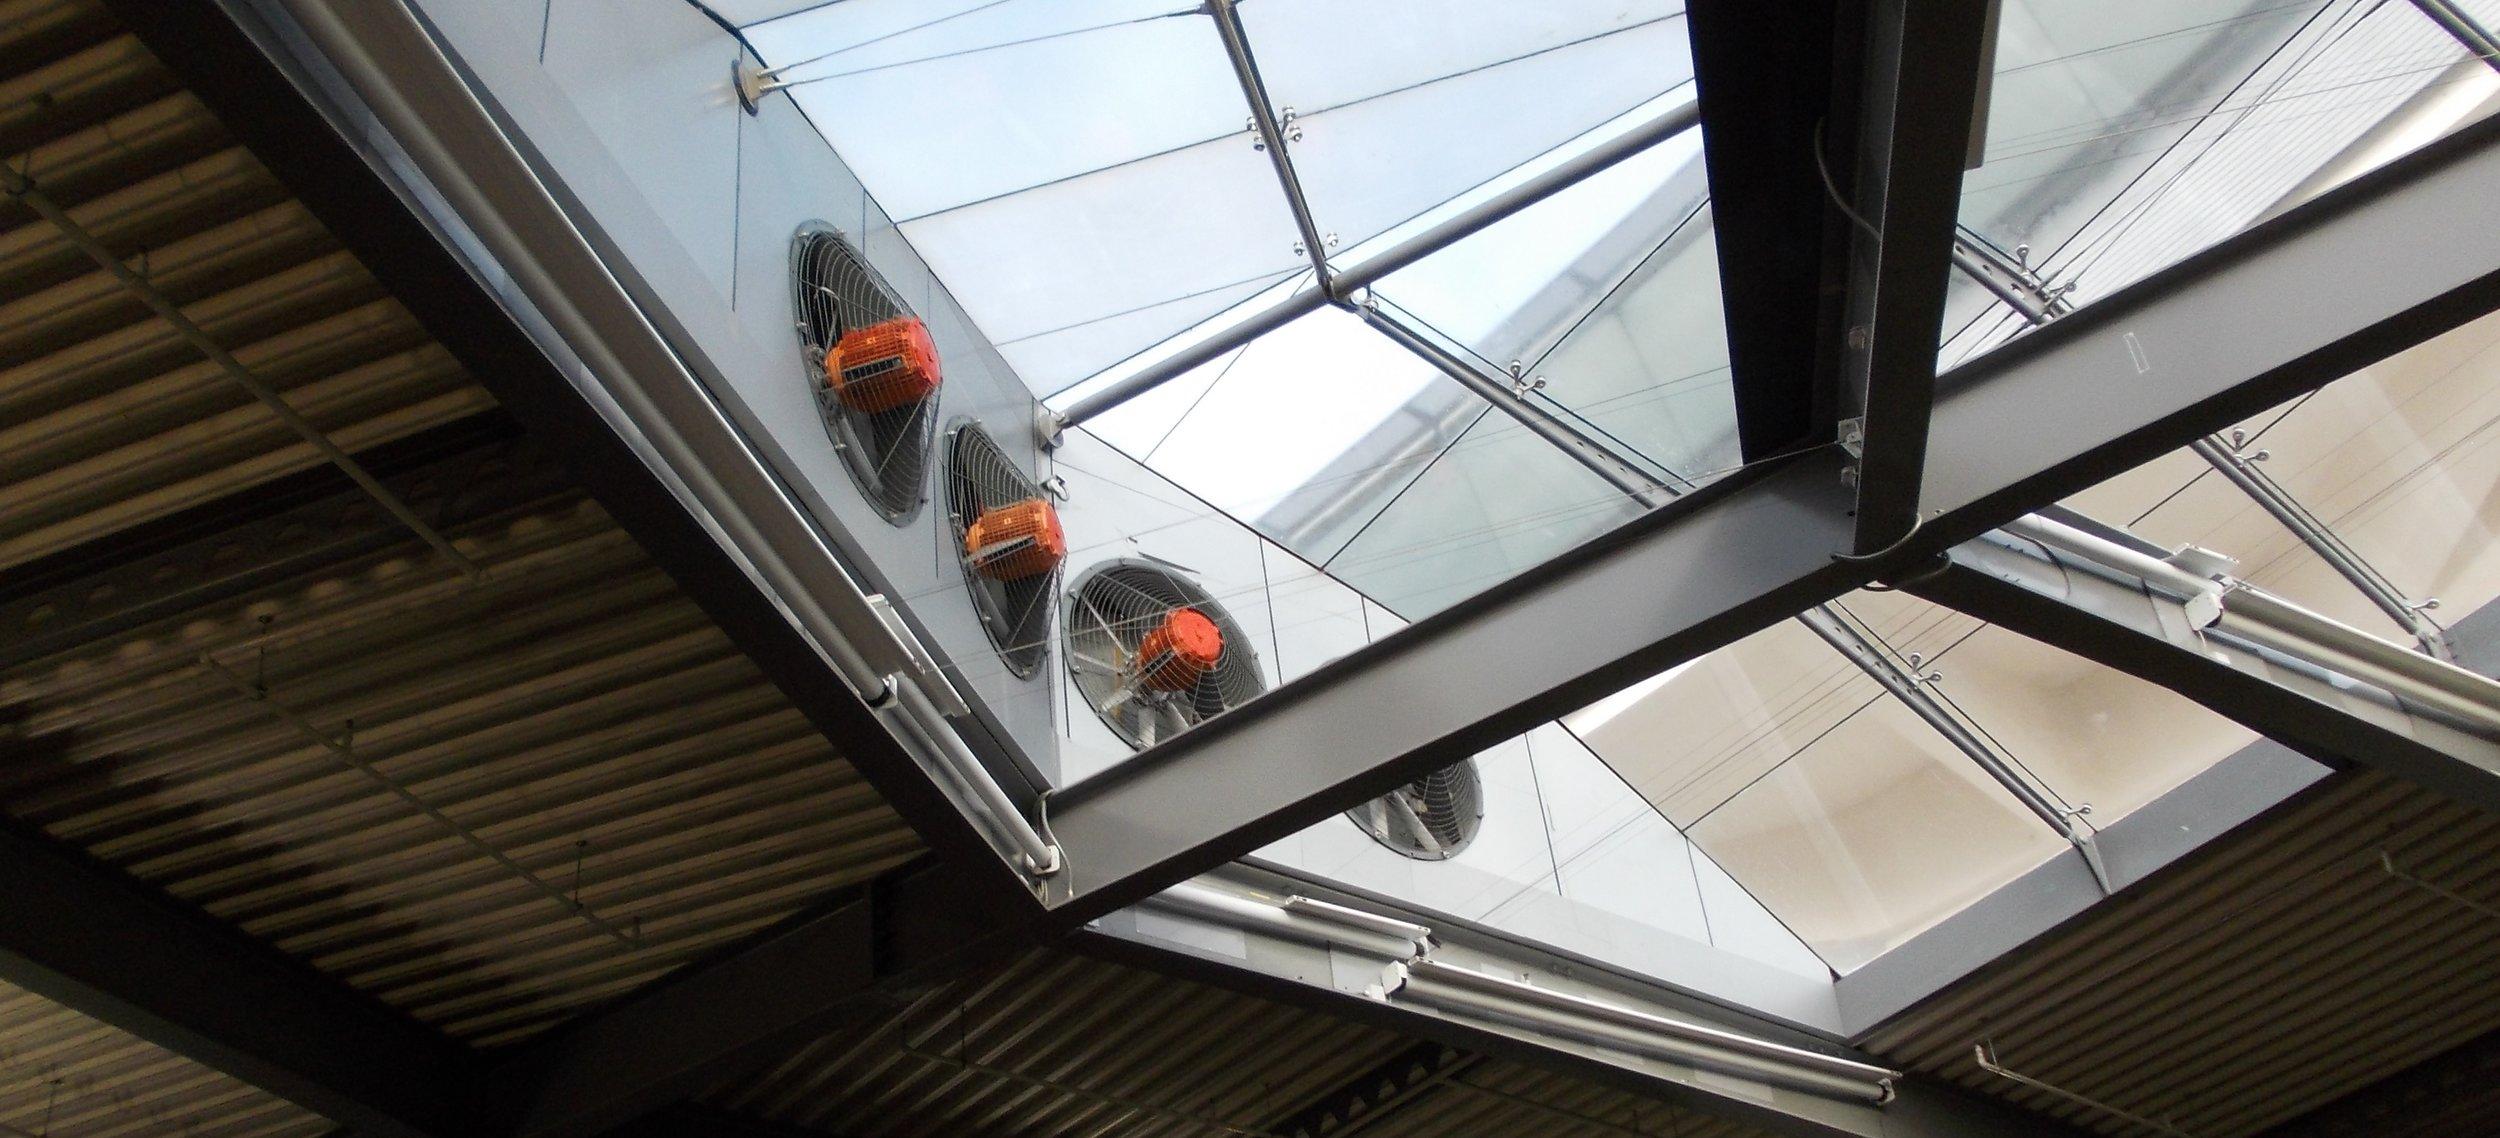 The Ship Gallery Ventilation Maintenance